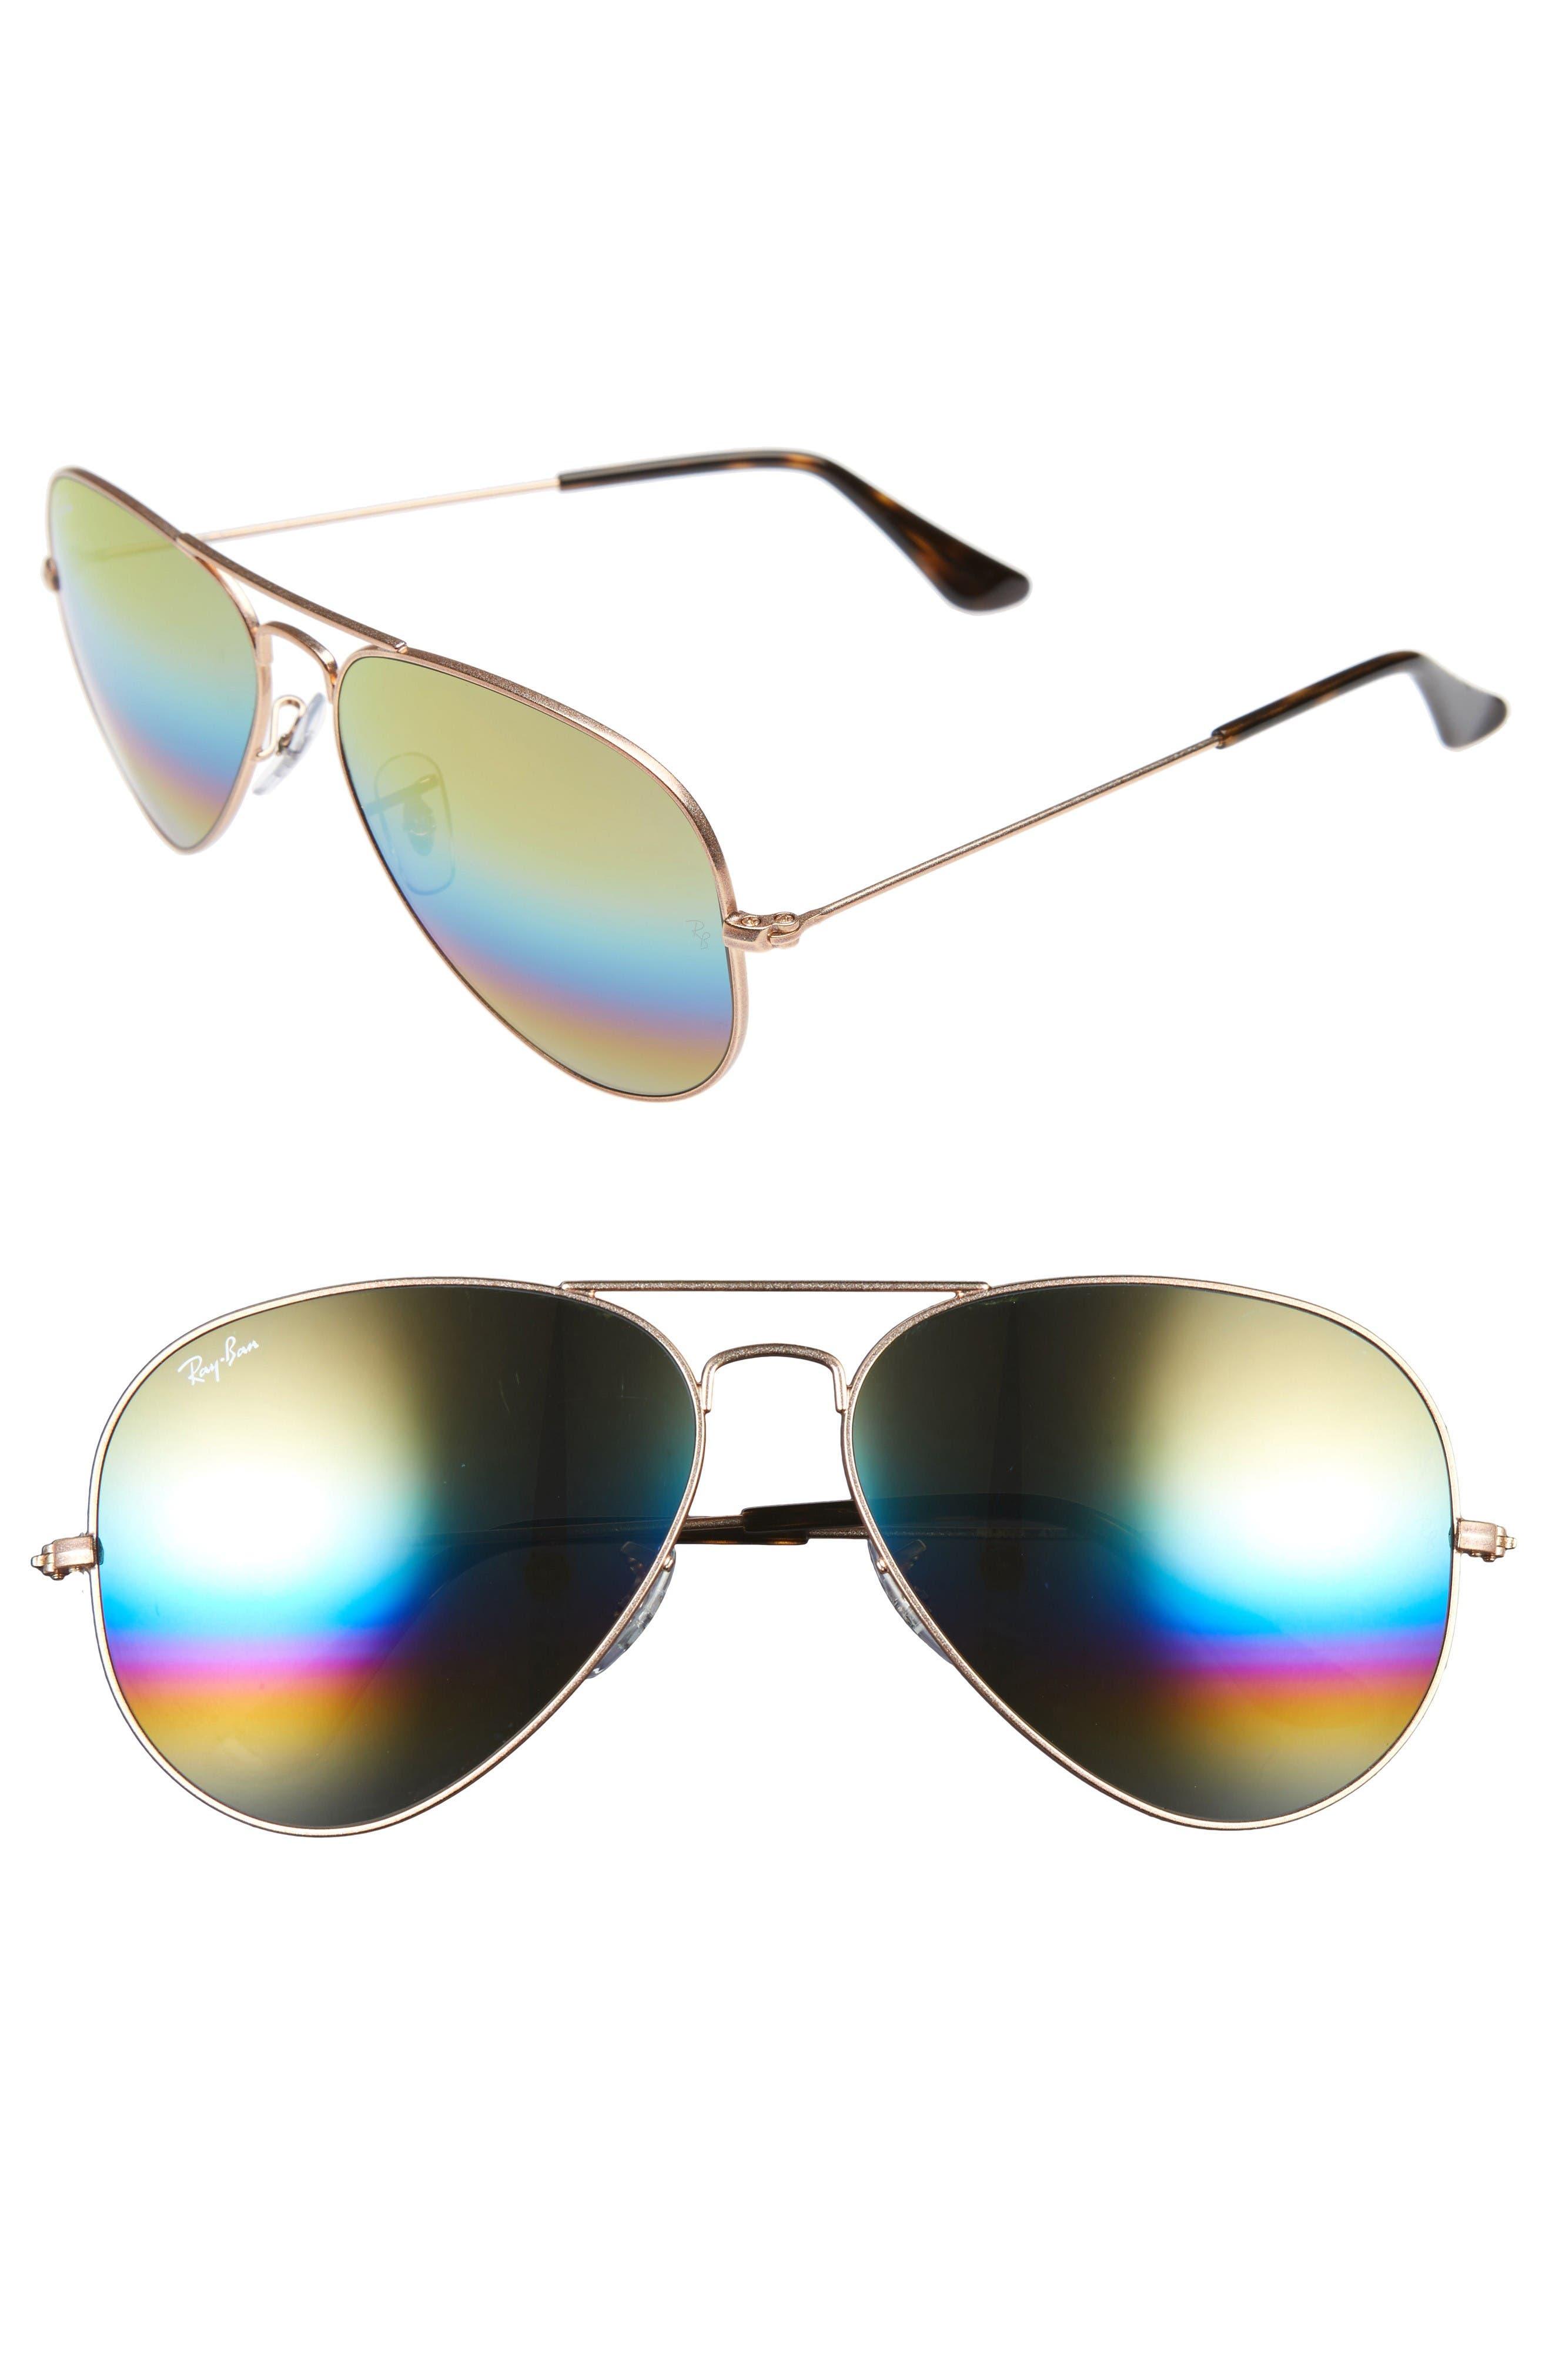 Main Image - Ray-Ban Standard Icons 58mm Mirrored Rainbow Aviator Sunglasses